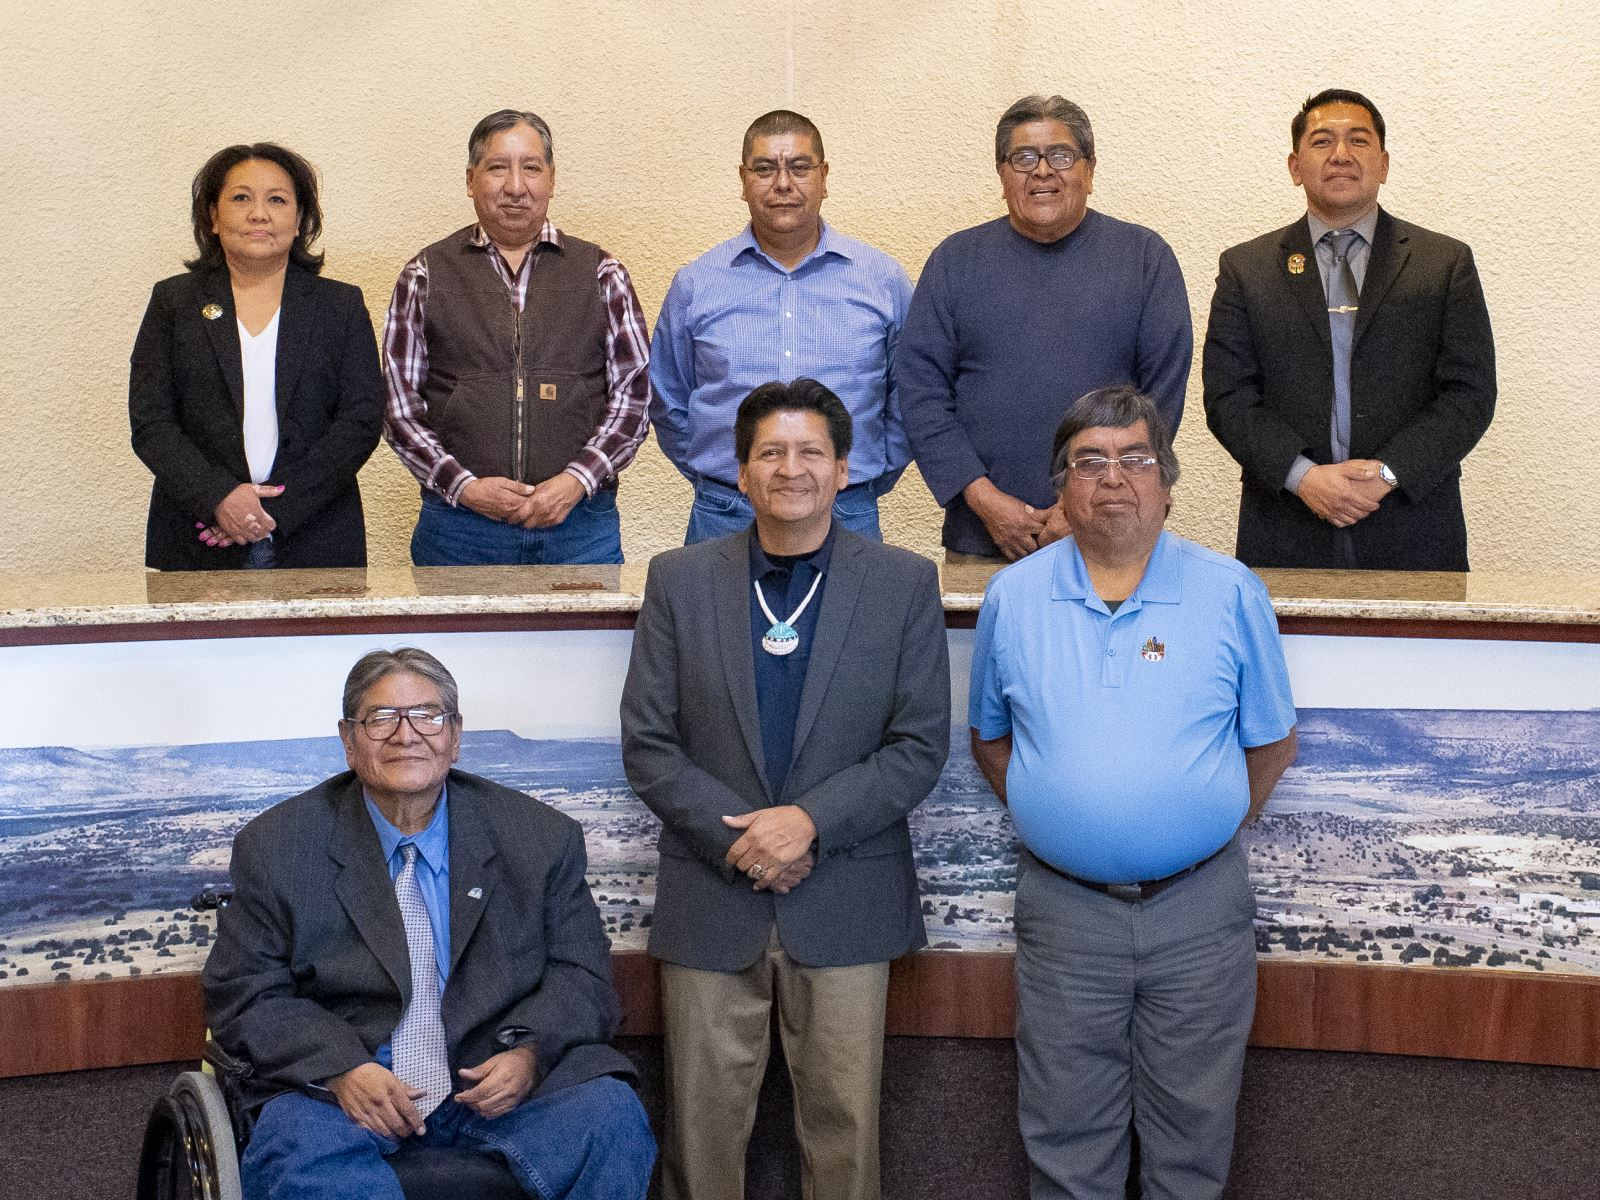 2020 Pueblo of Laguna Council